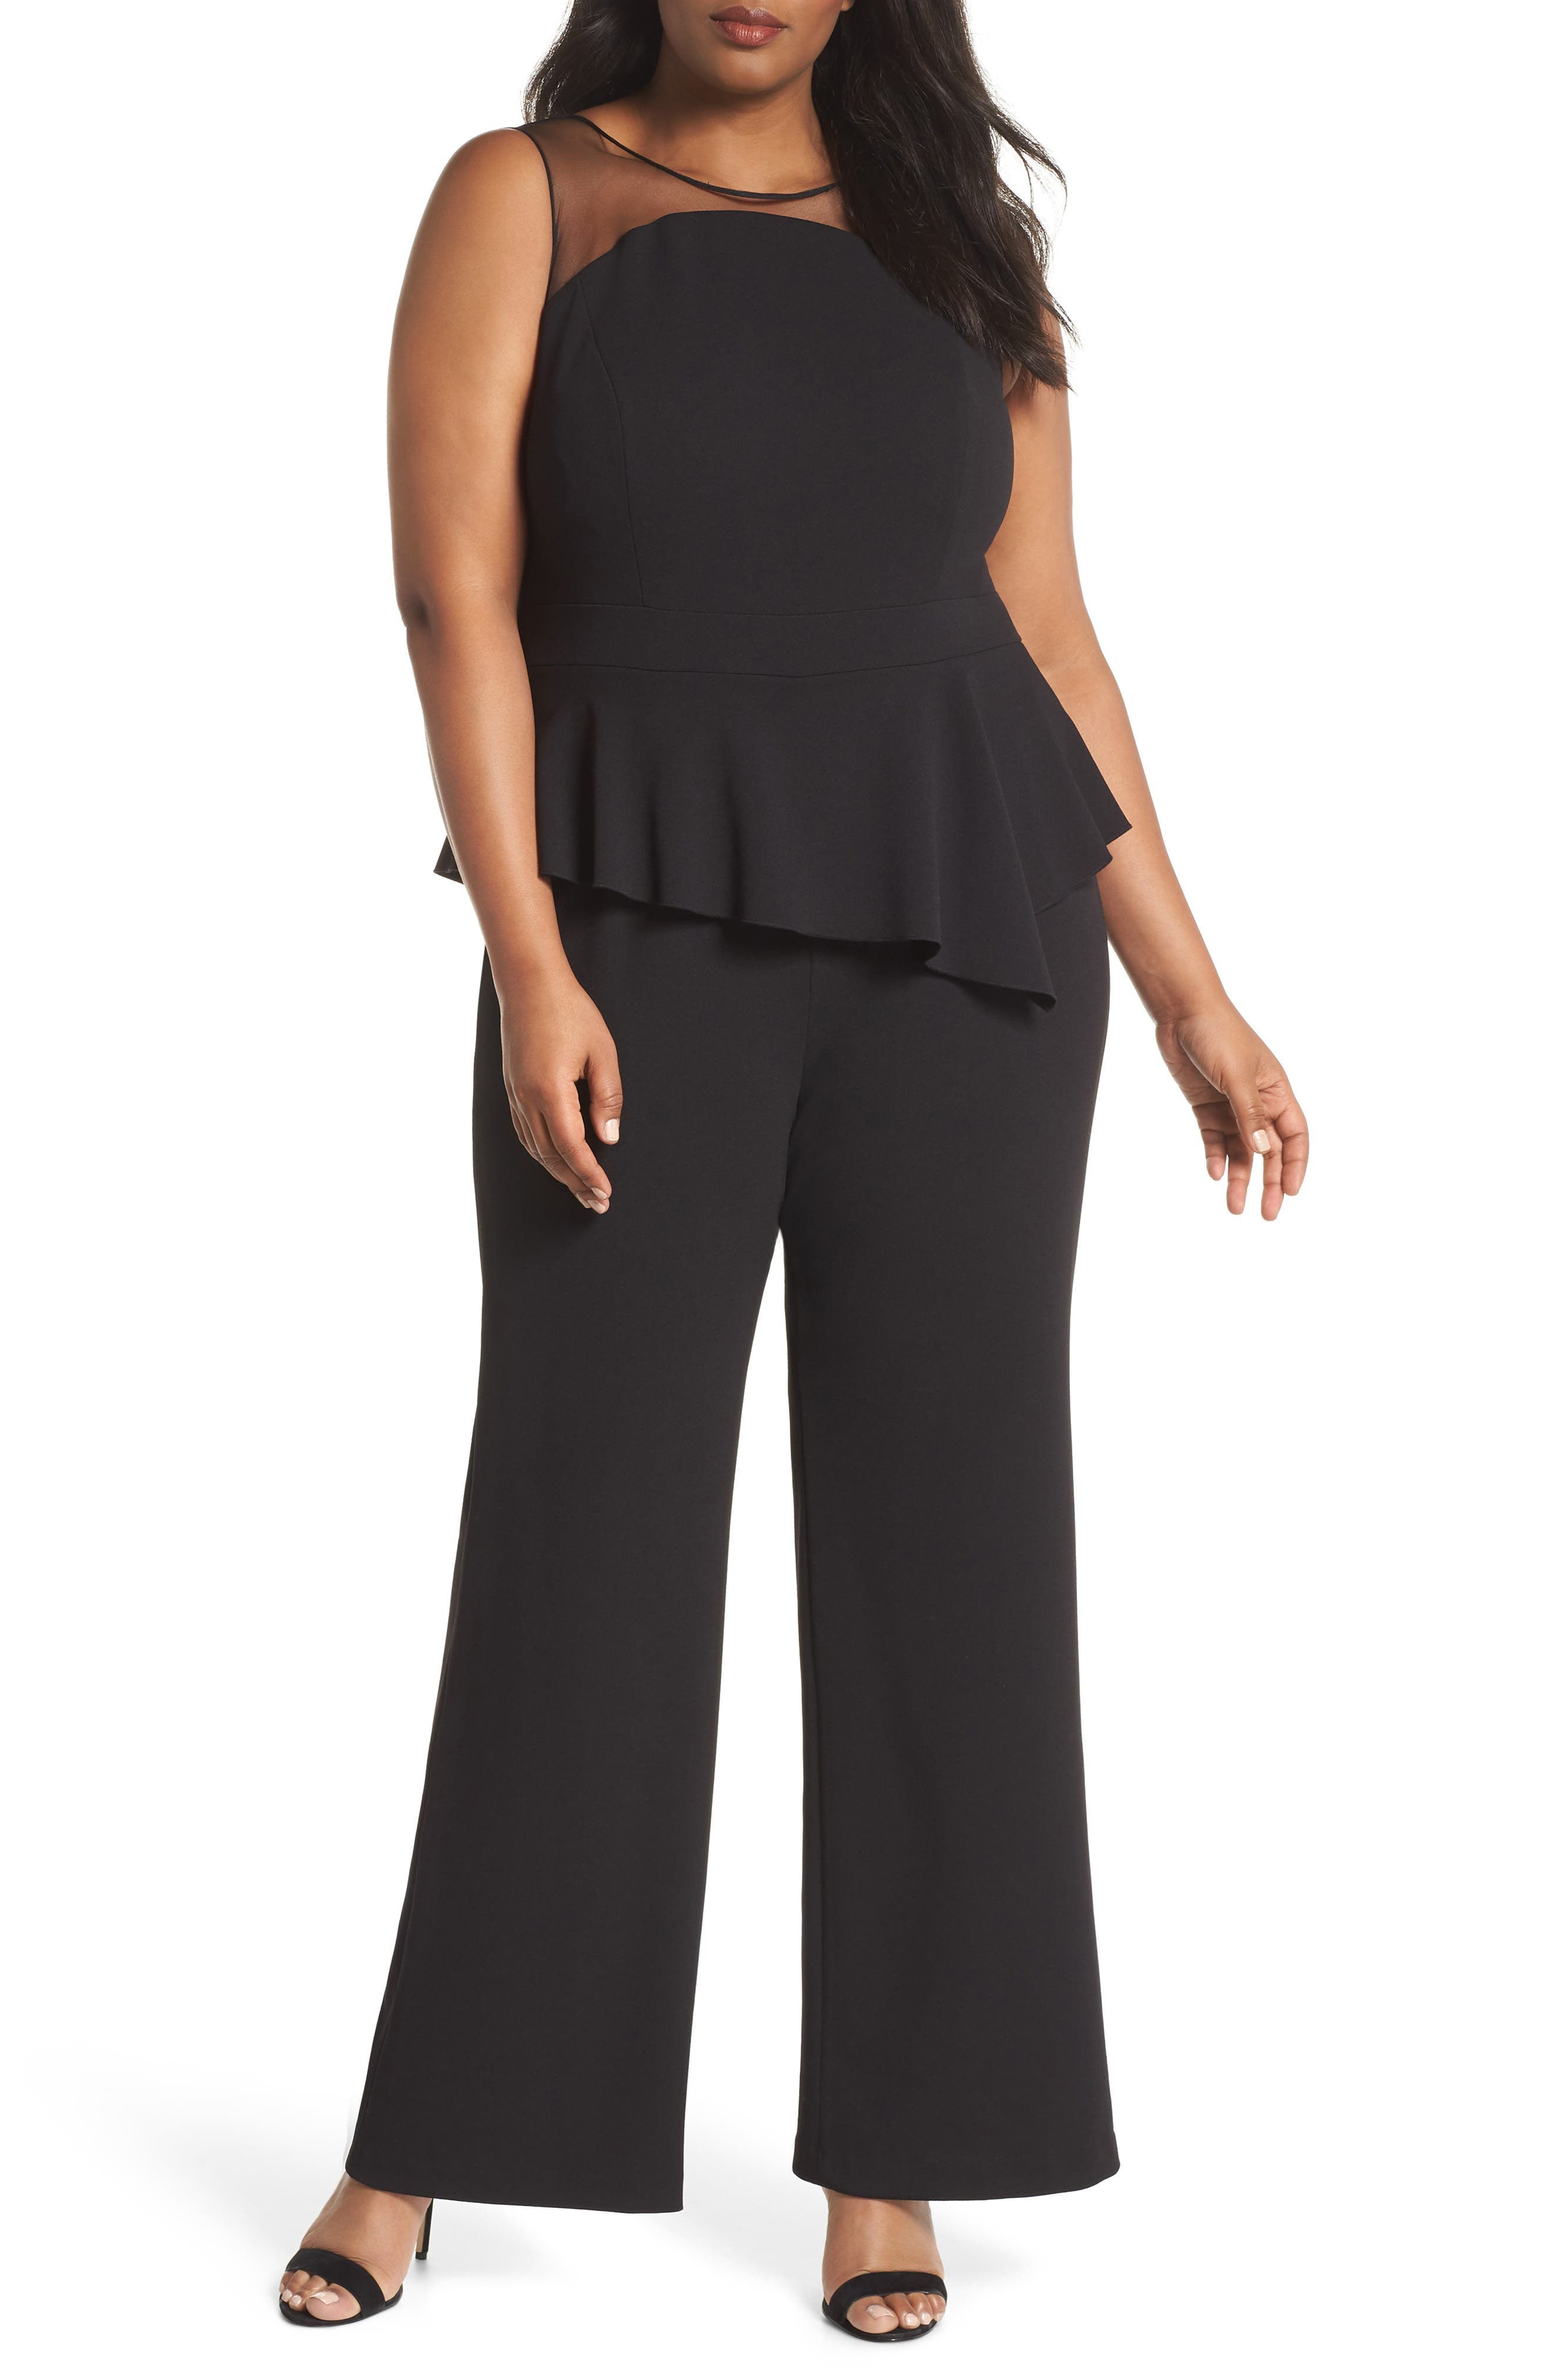 Adrianna Papell Illusion Neck Crepe Jumpsuit (Plus Size)